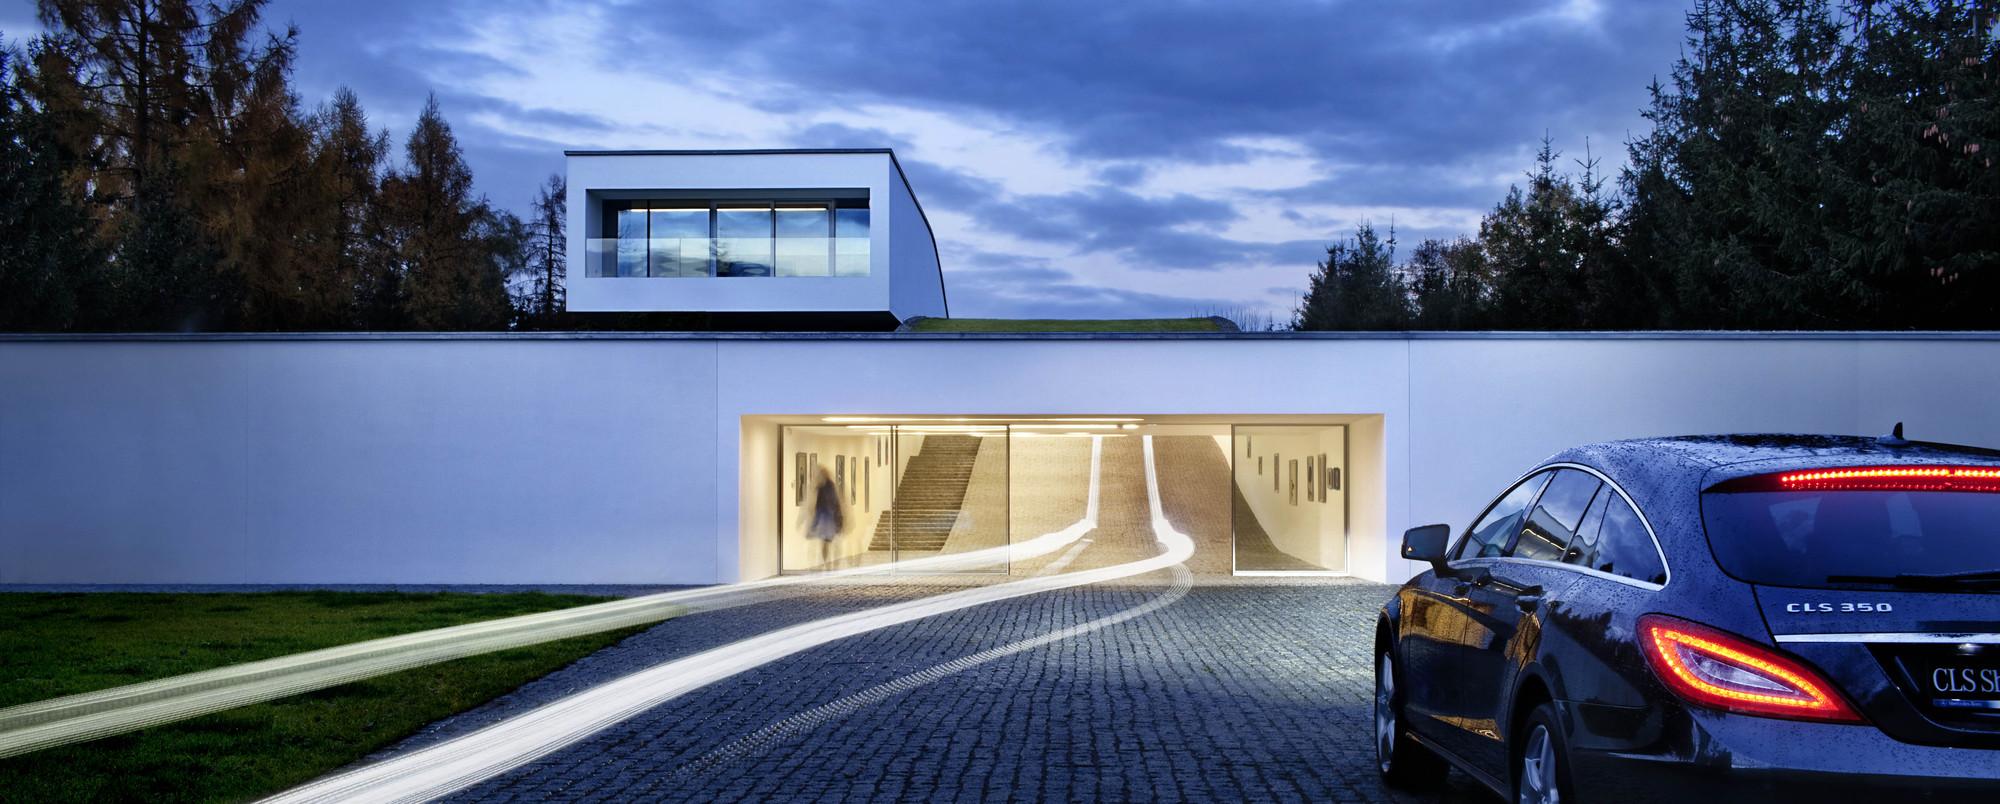 Gallery of autofamily house kwk promes 7 for Garage con studio